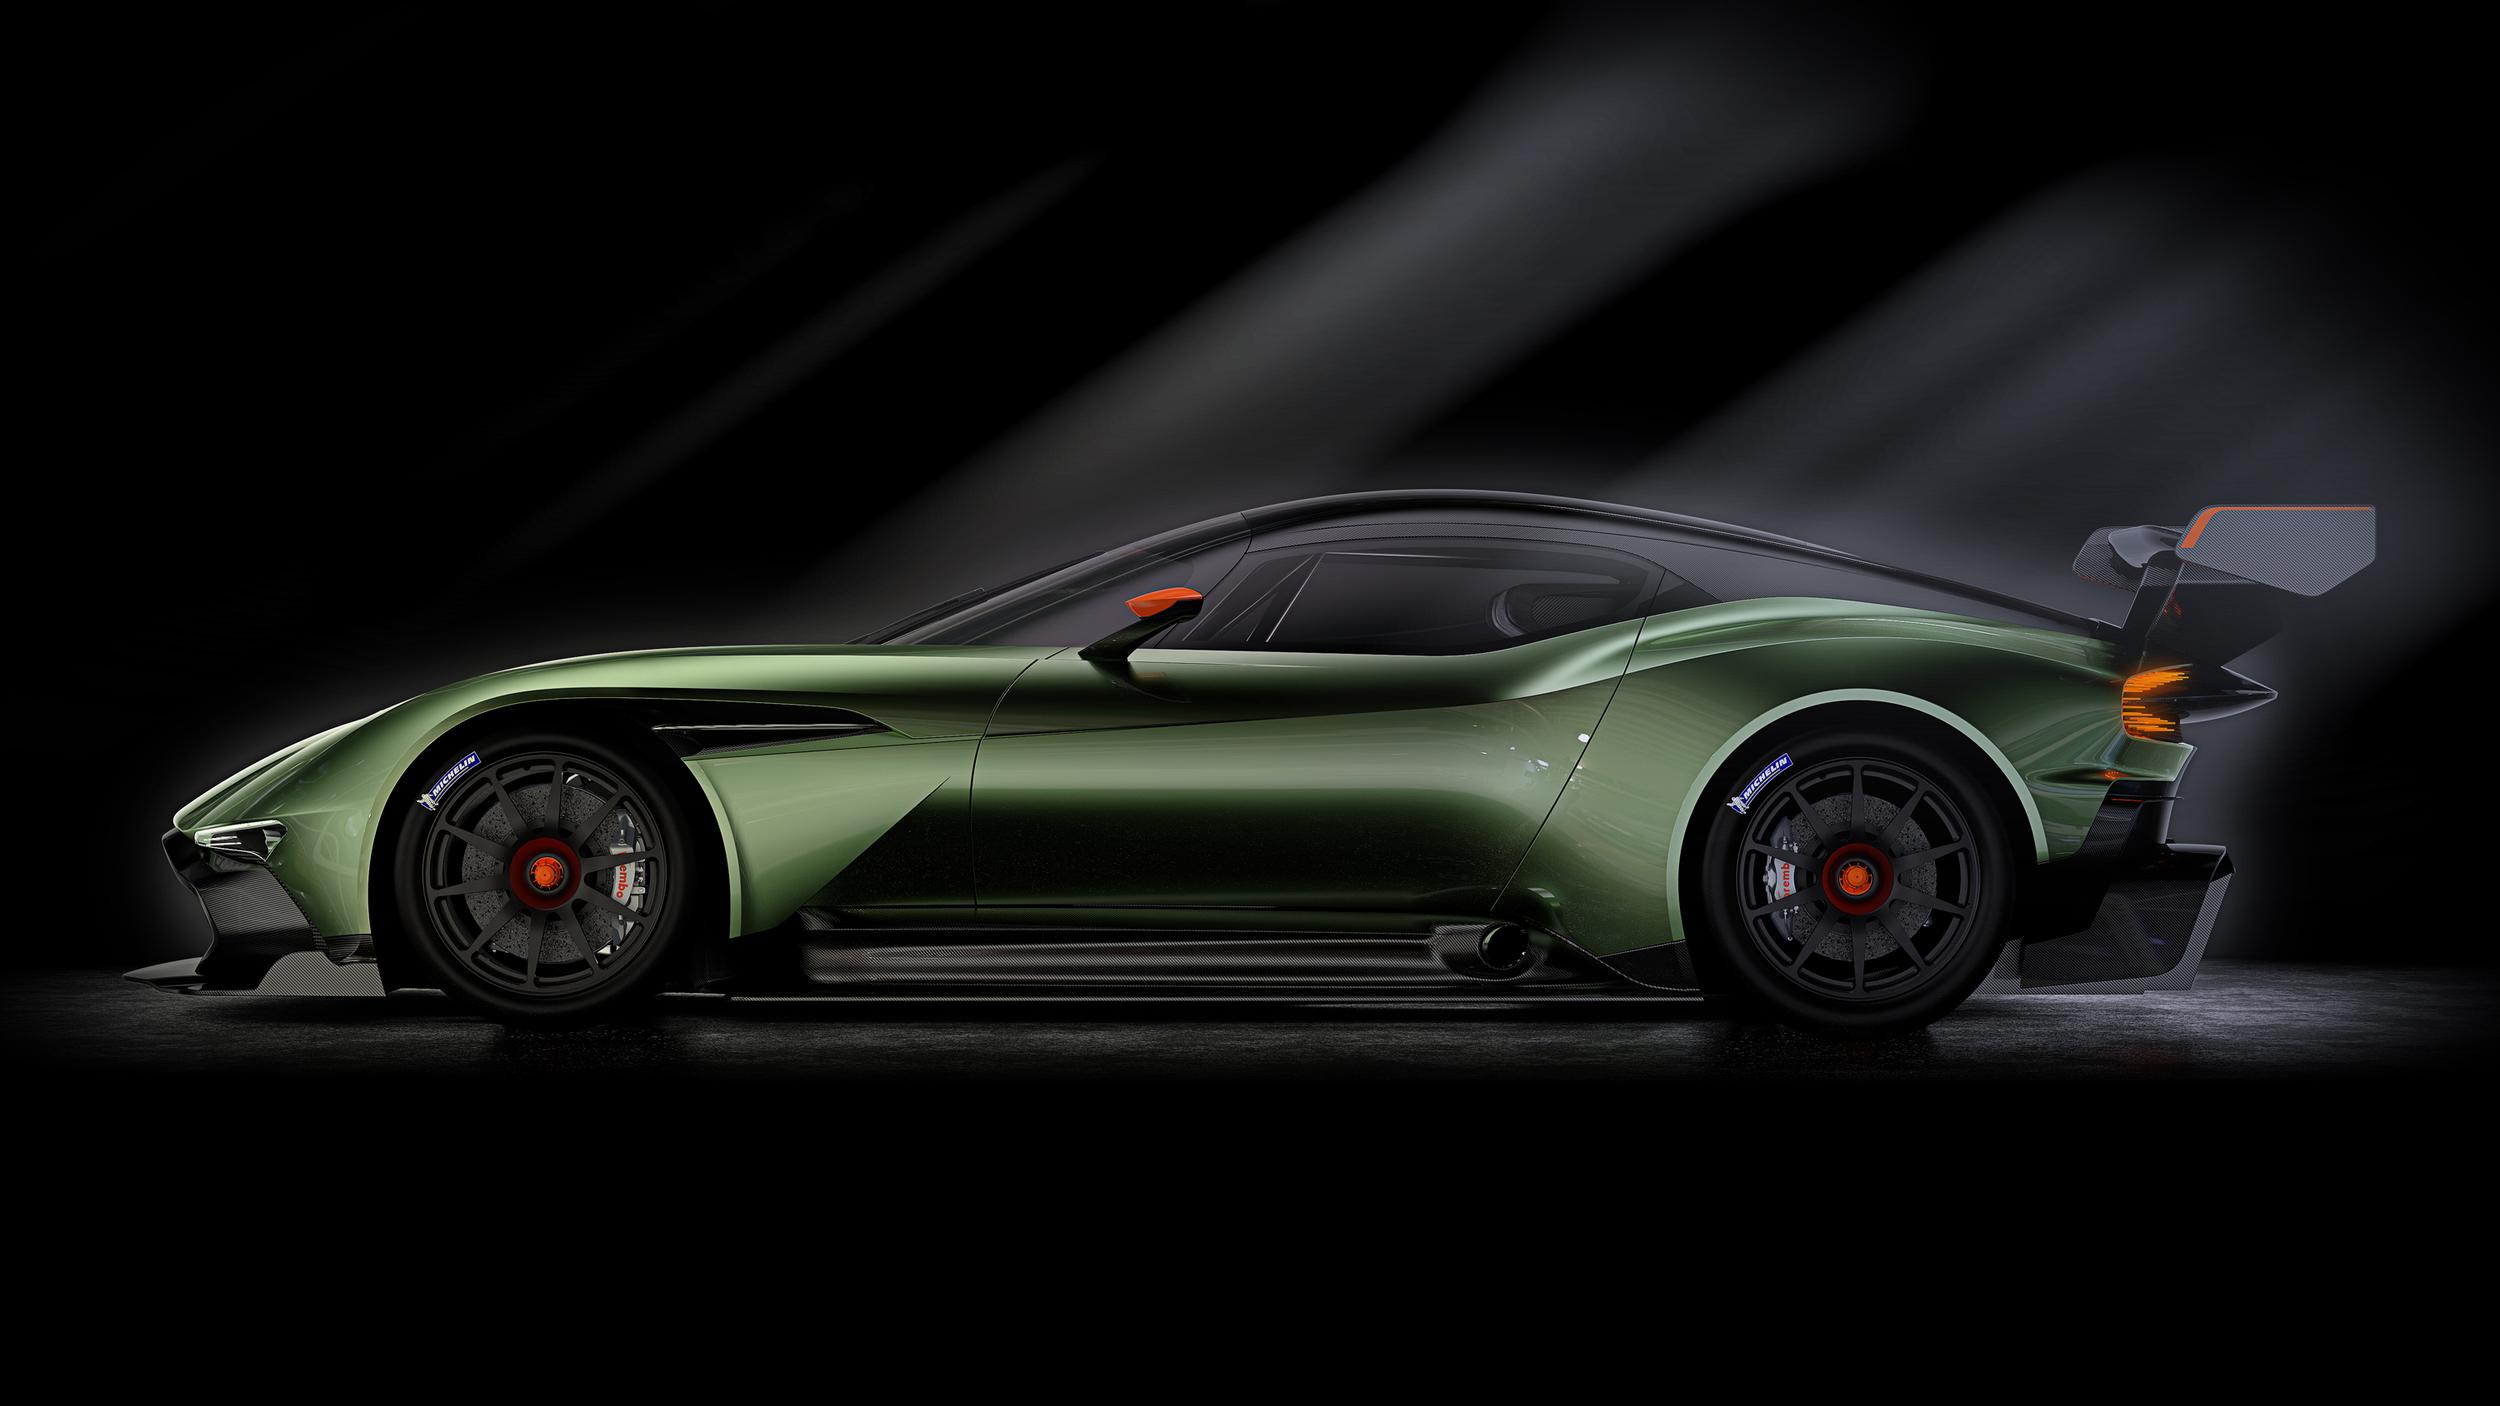 Aston Martin Vulcan - profil